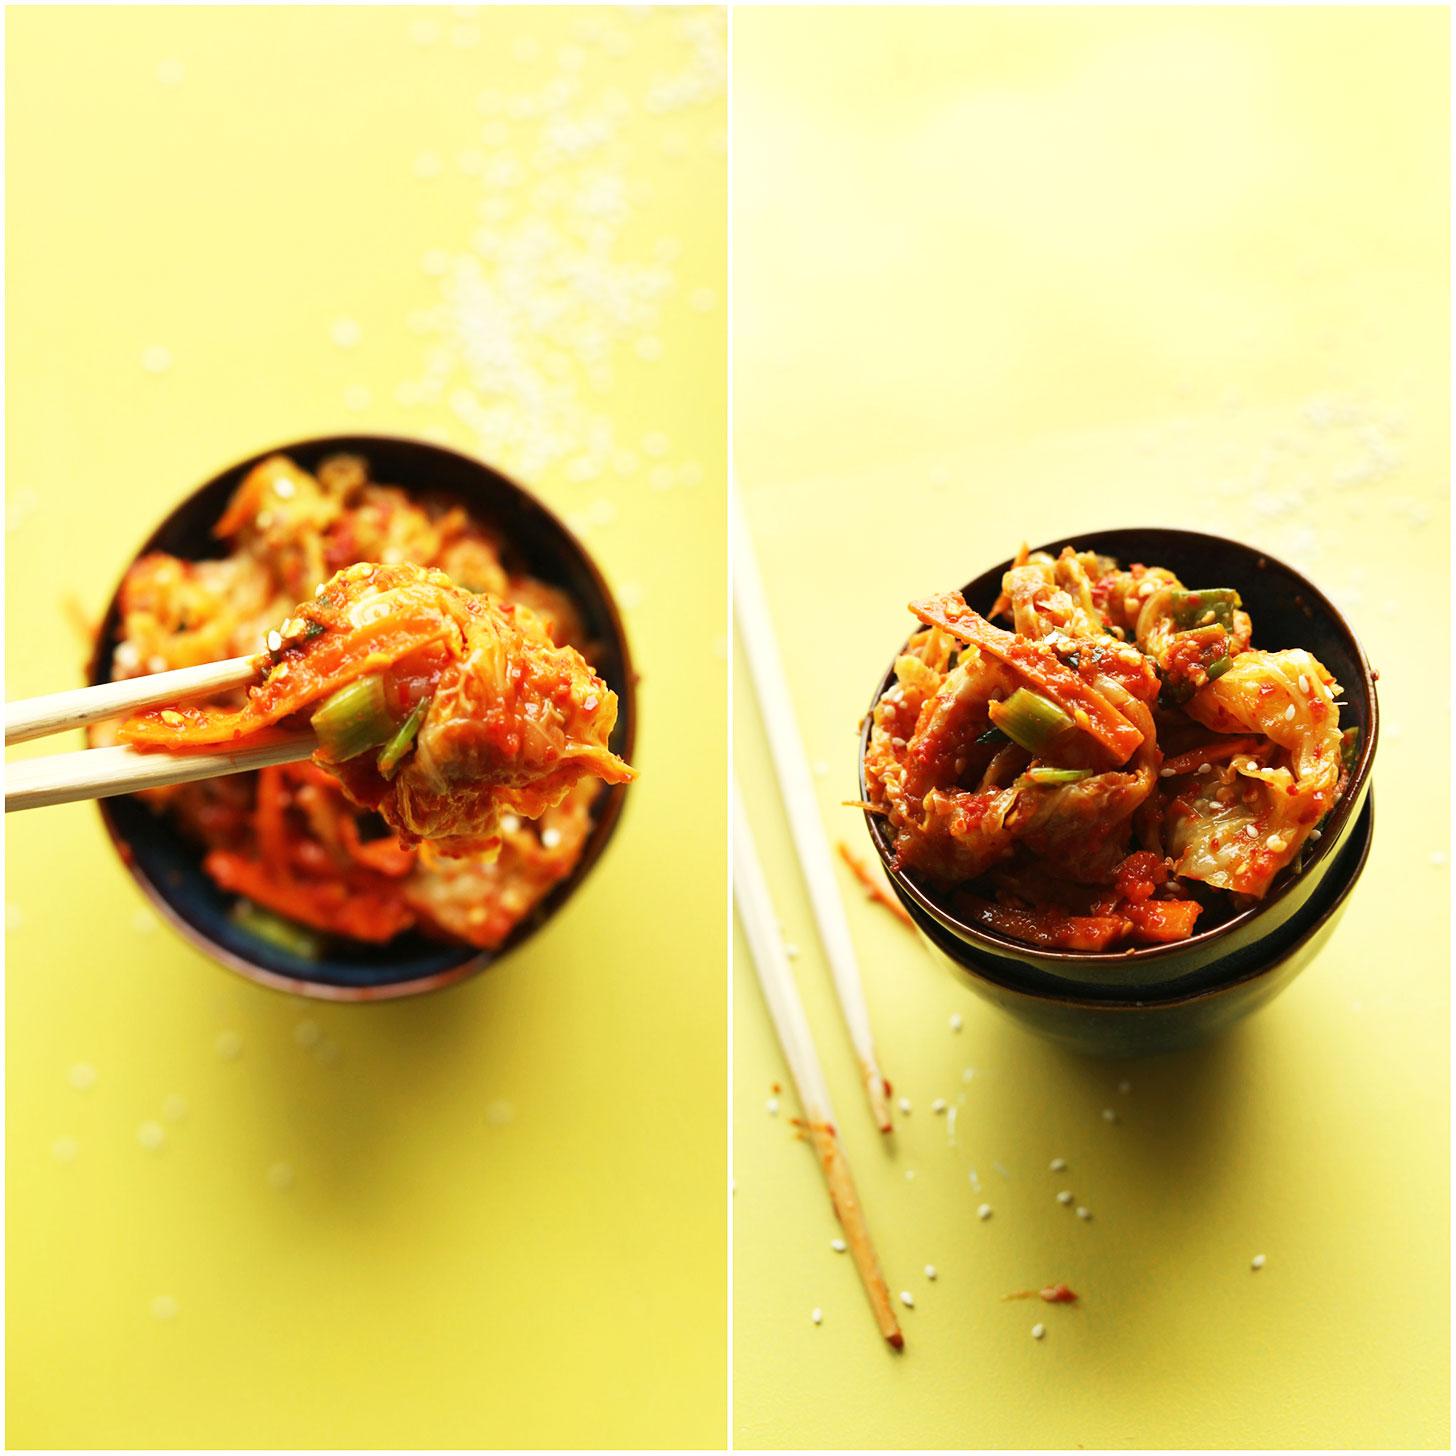 AMAZING Vegan Kimchi! 10 ingredients, crunchy, spicy, DELICIOUS! #vegan #kimchi #glutenfree #recipe #minimalistbaker